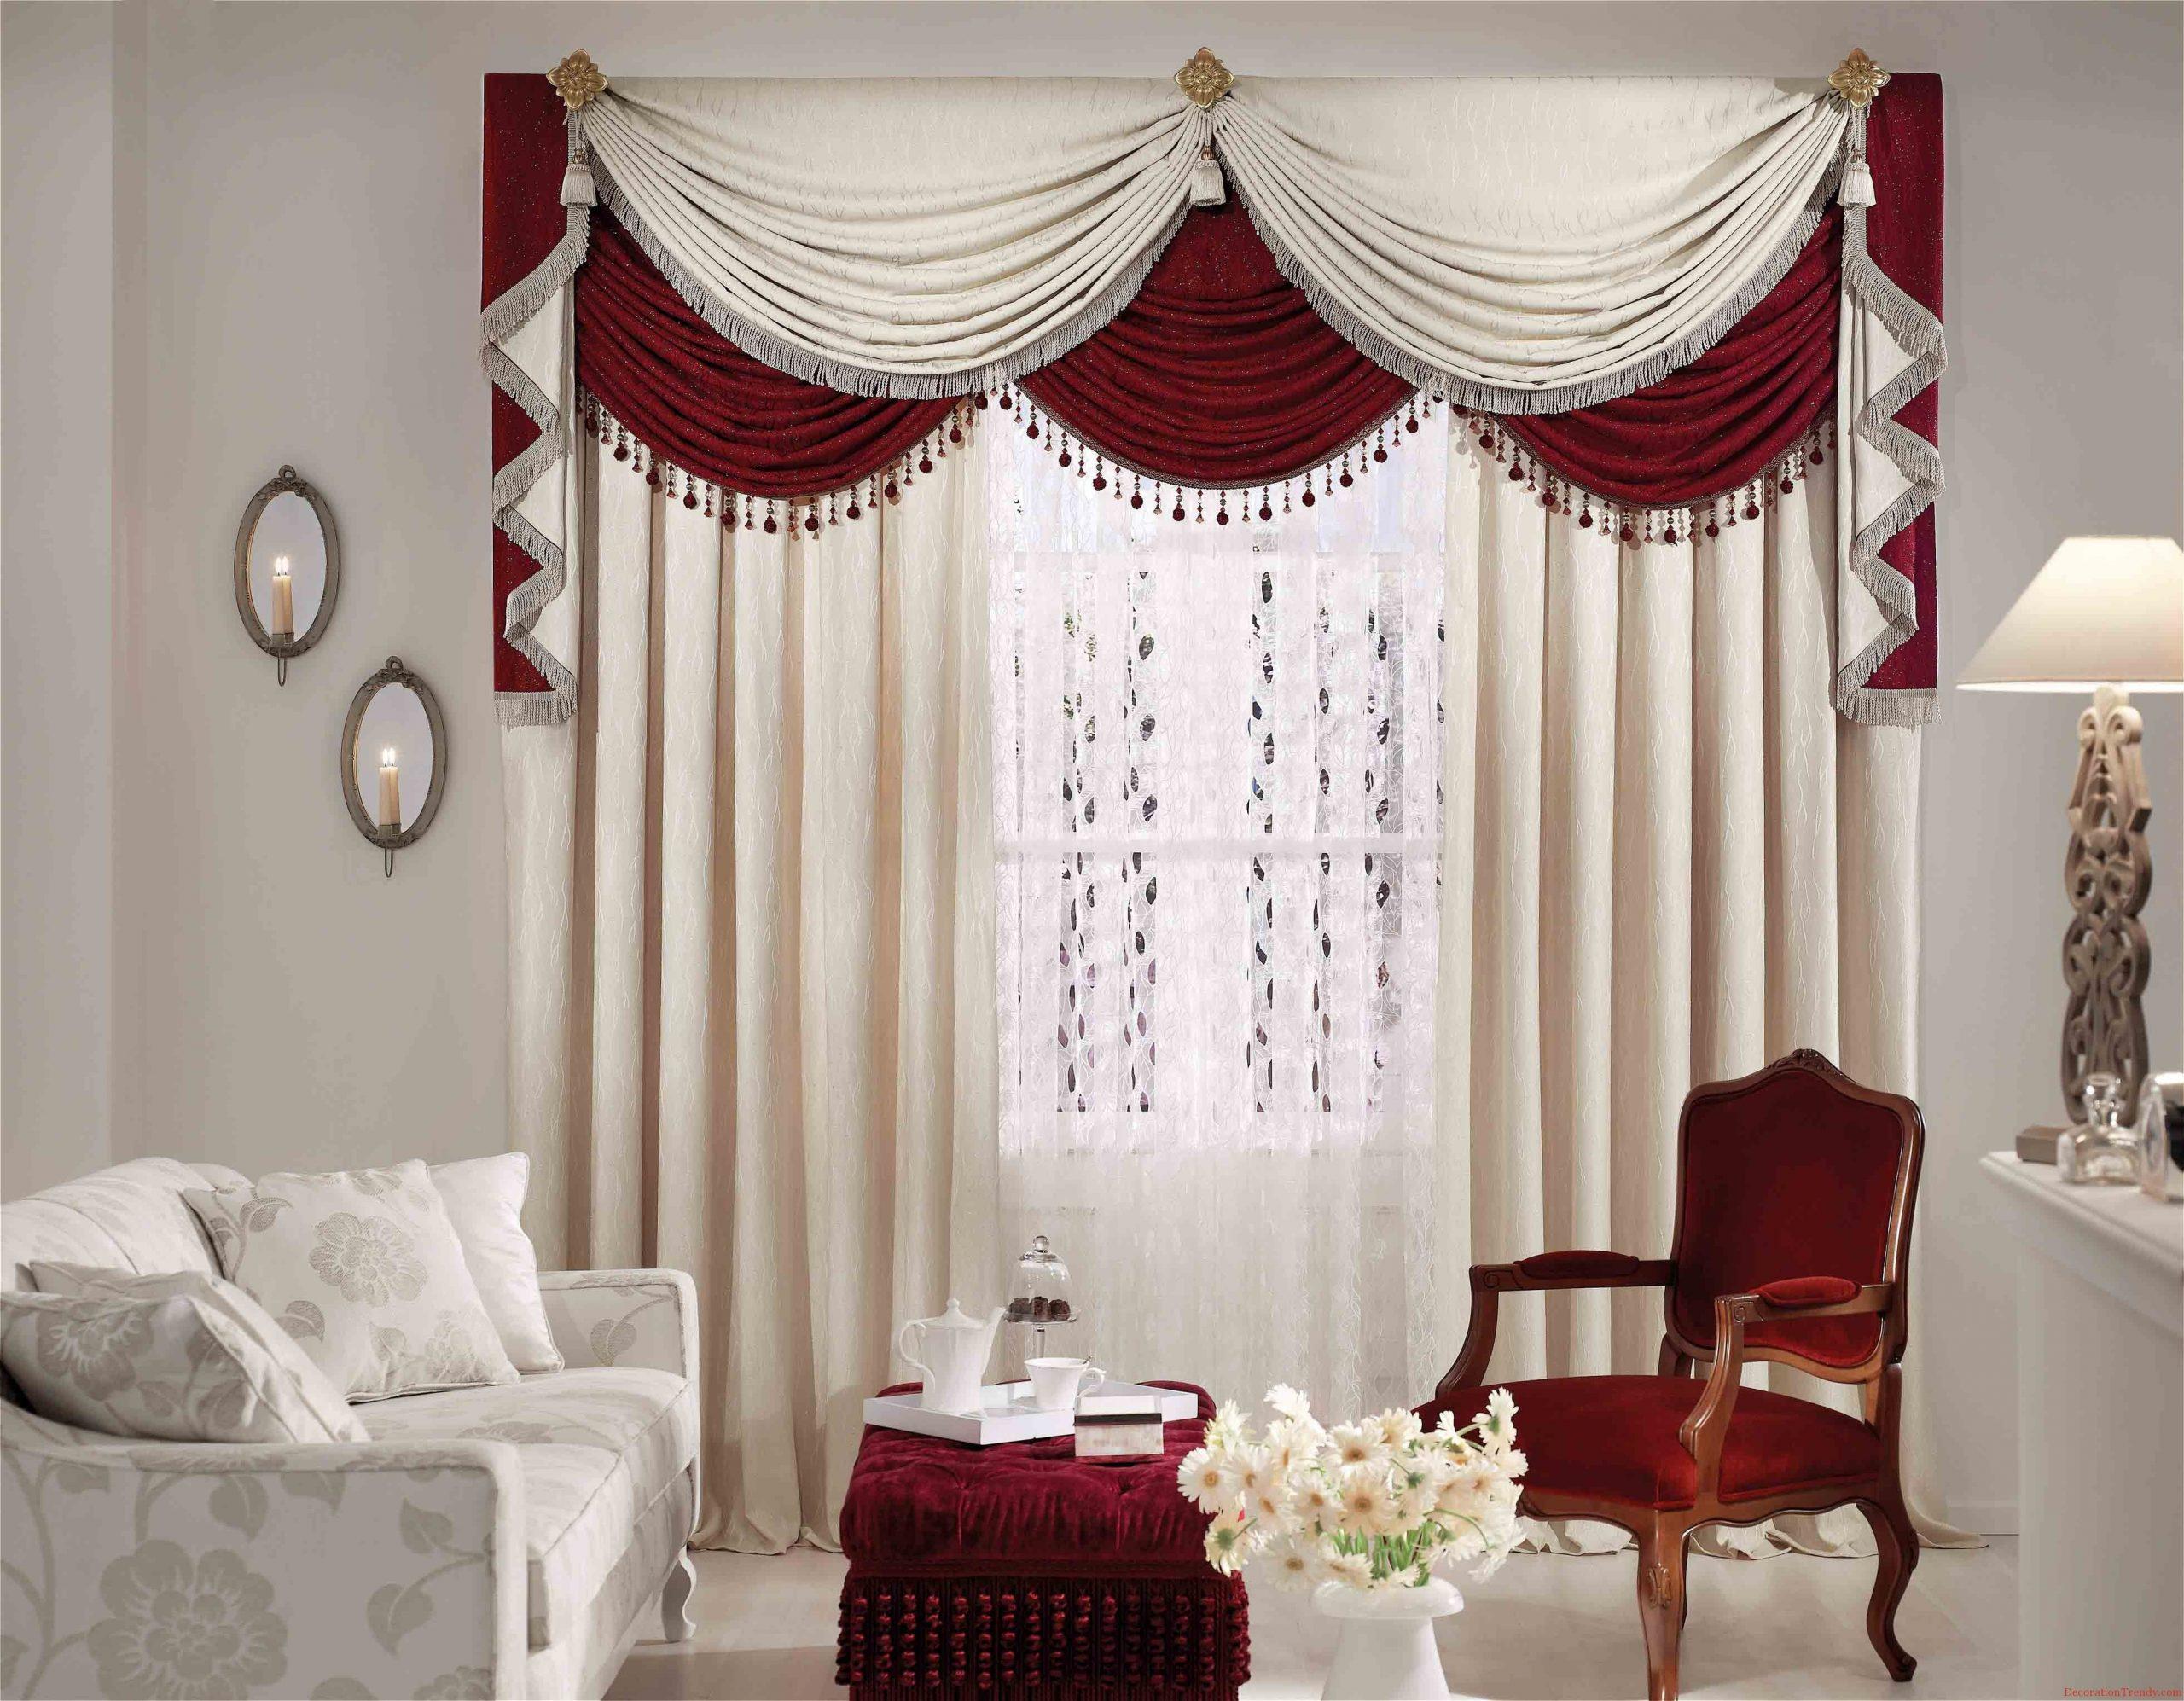 Full Size of Beauteous Design Ideas Of Curtain Styles For Living Room With Red Gardinen Für Schlafzimmer Led Lampen Wohnzimmer Schrank Fenster Vitrine Weiß Gardine Wohnzimmer Gardinen Dekorationsvorschläge Wohnzimmer